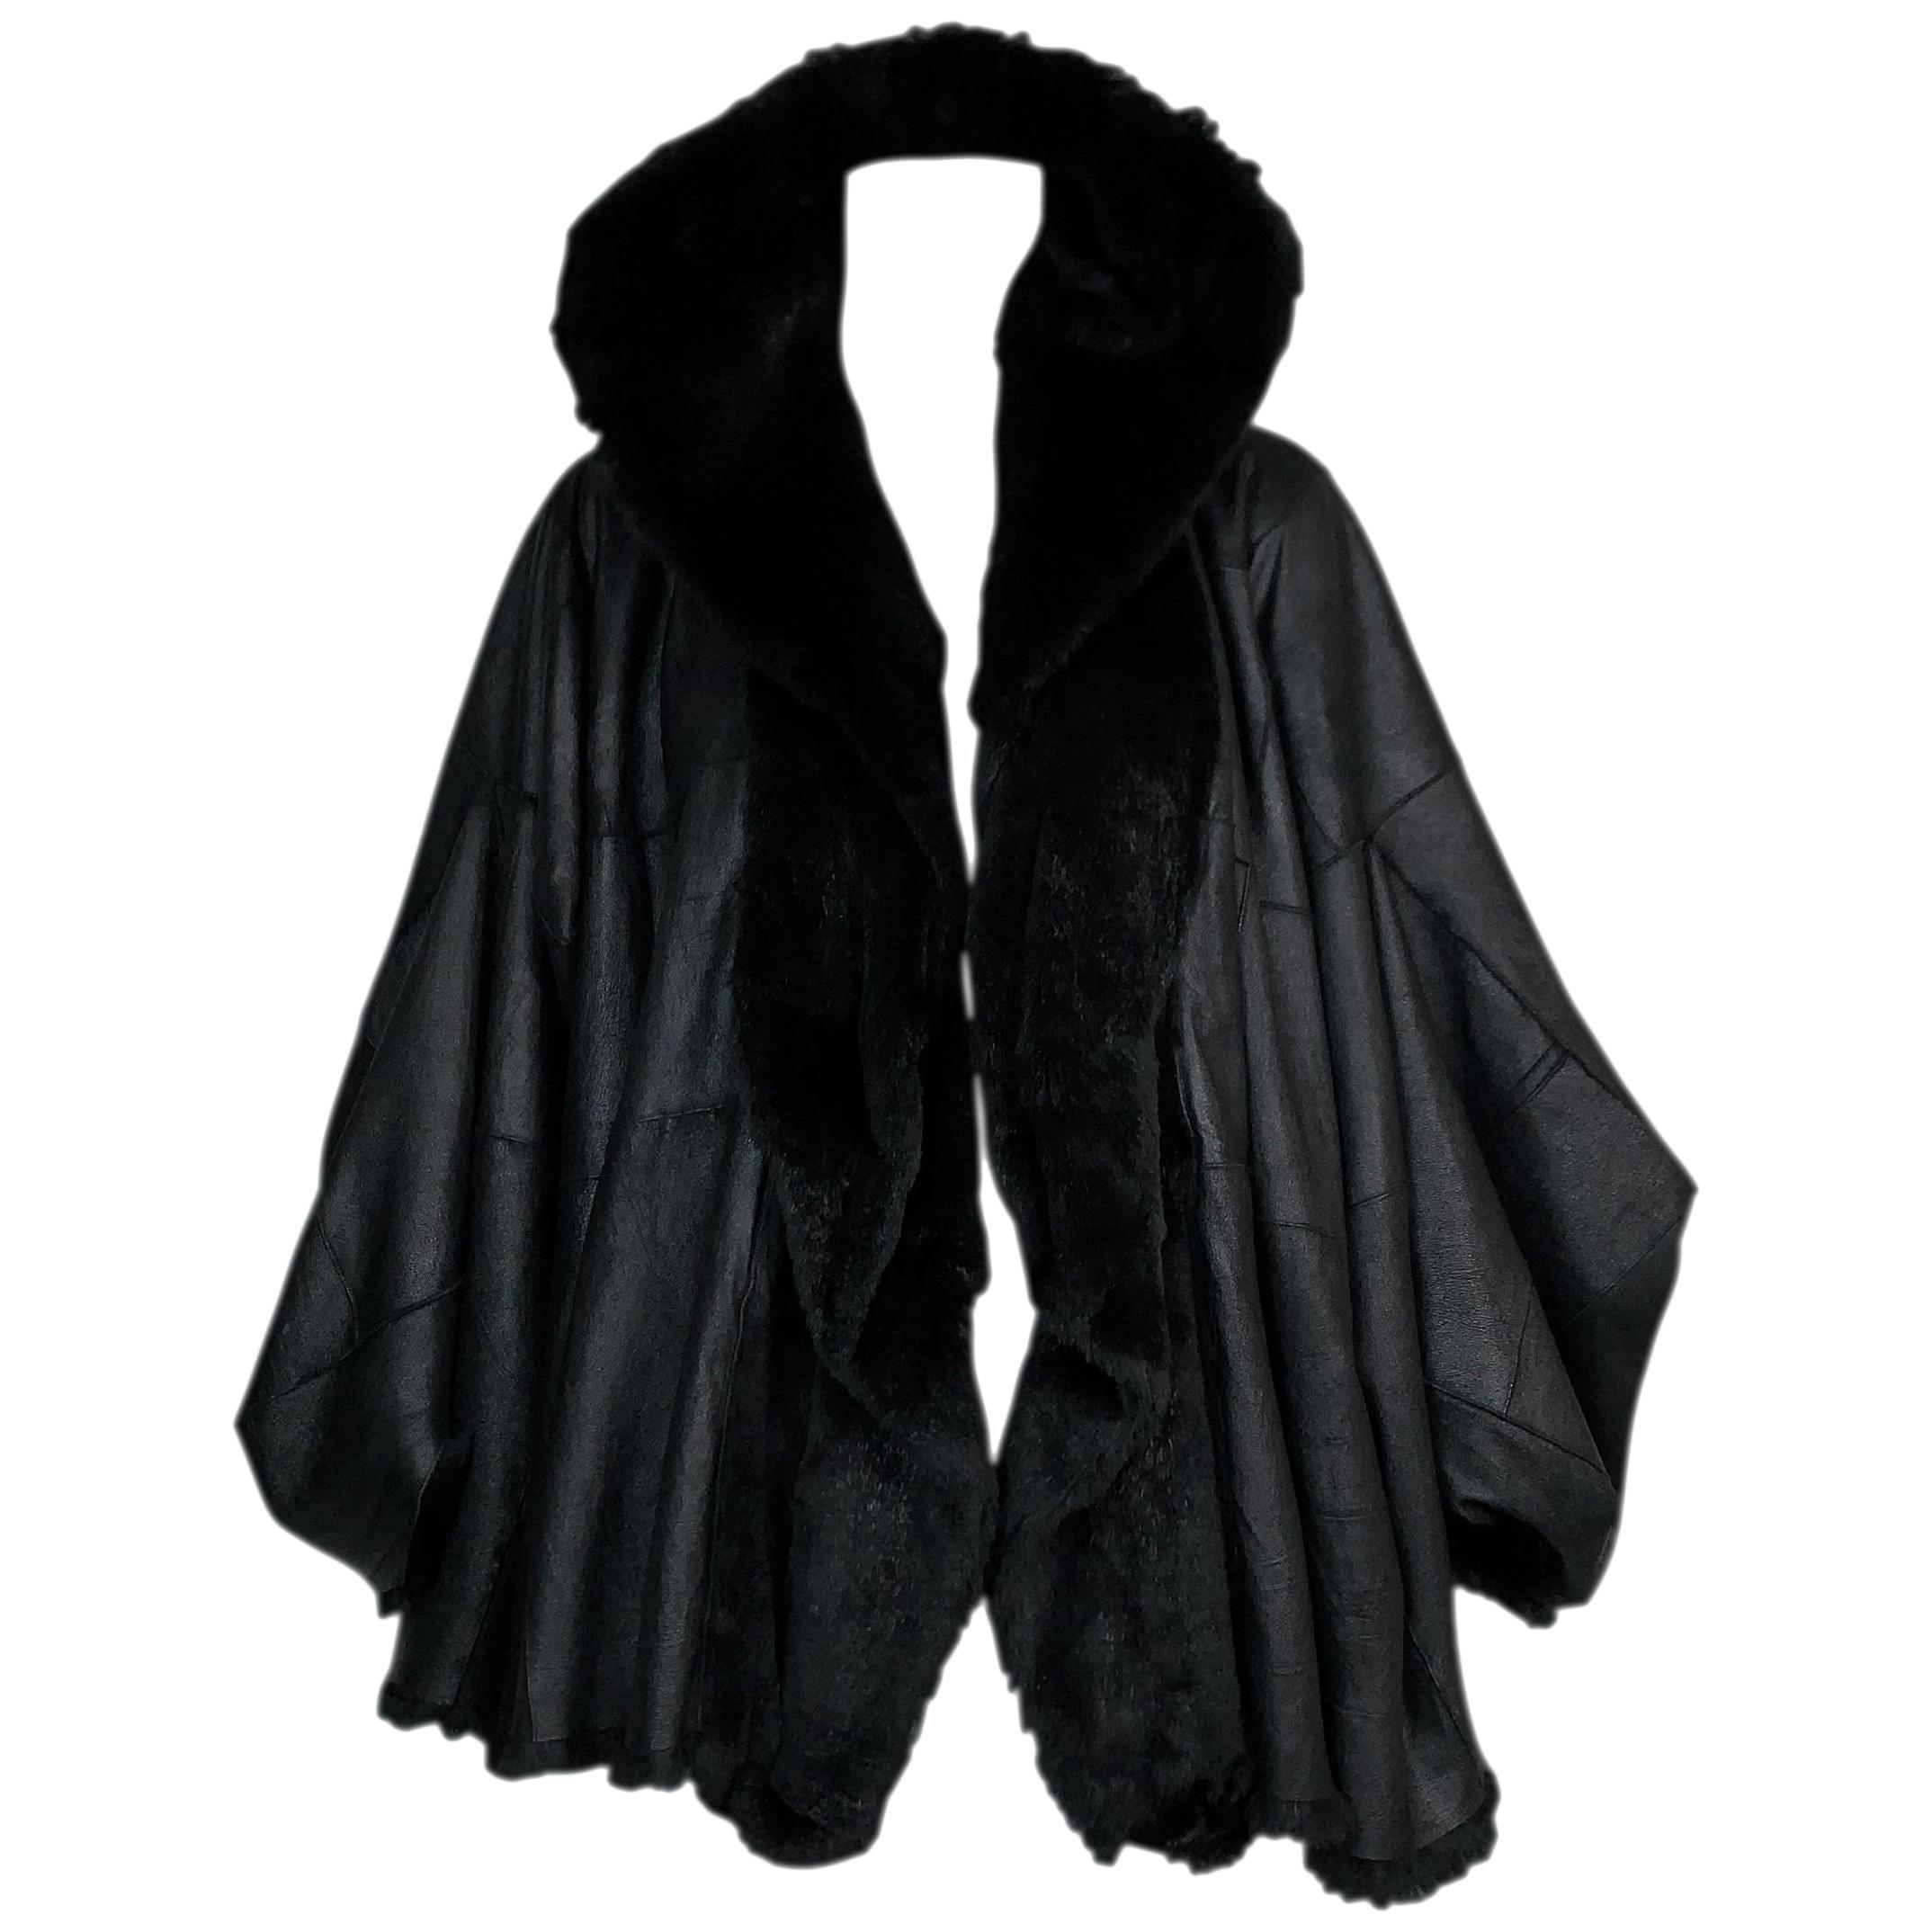 F/W 2003 Christian Dior John Galliano Black Shearling Leather Coat Jacket